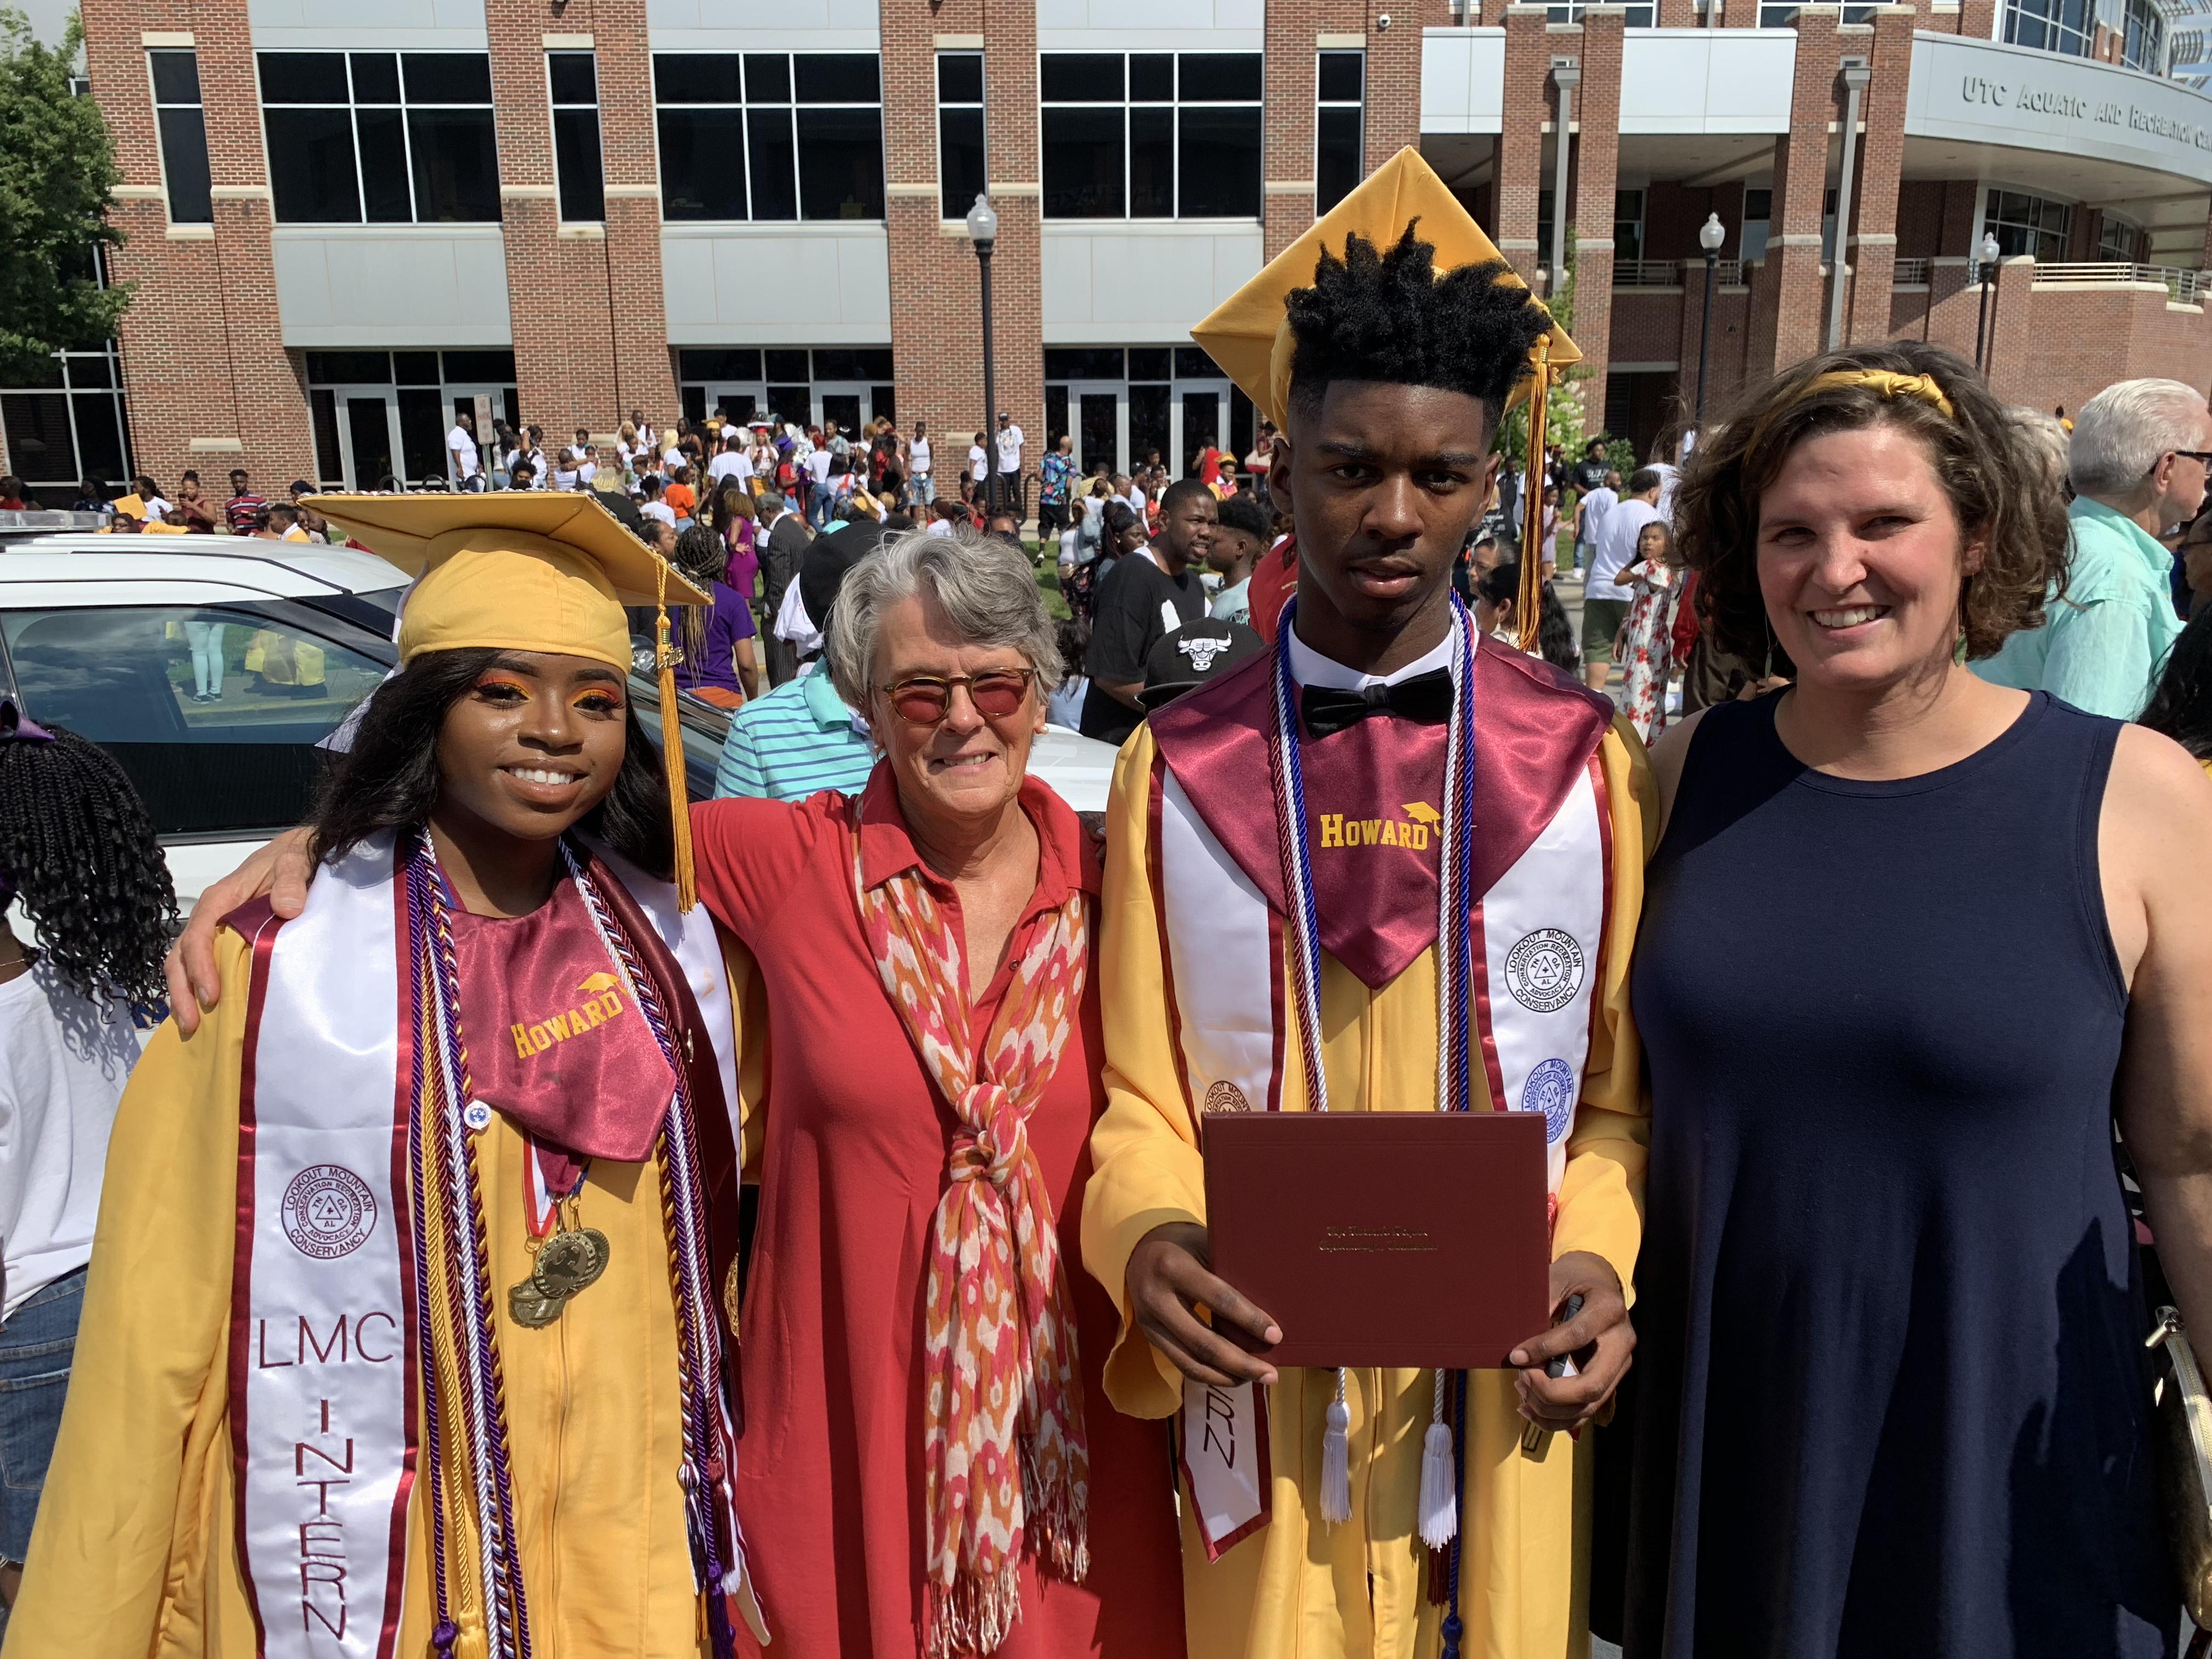 LMC staff with graduating seniors